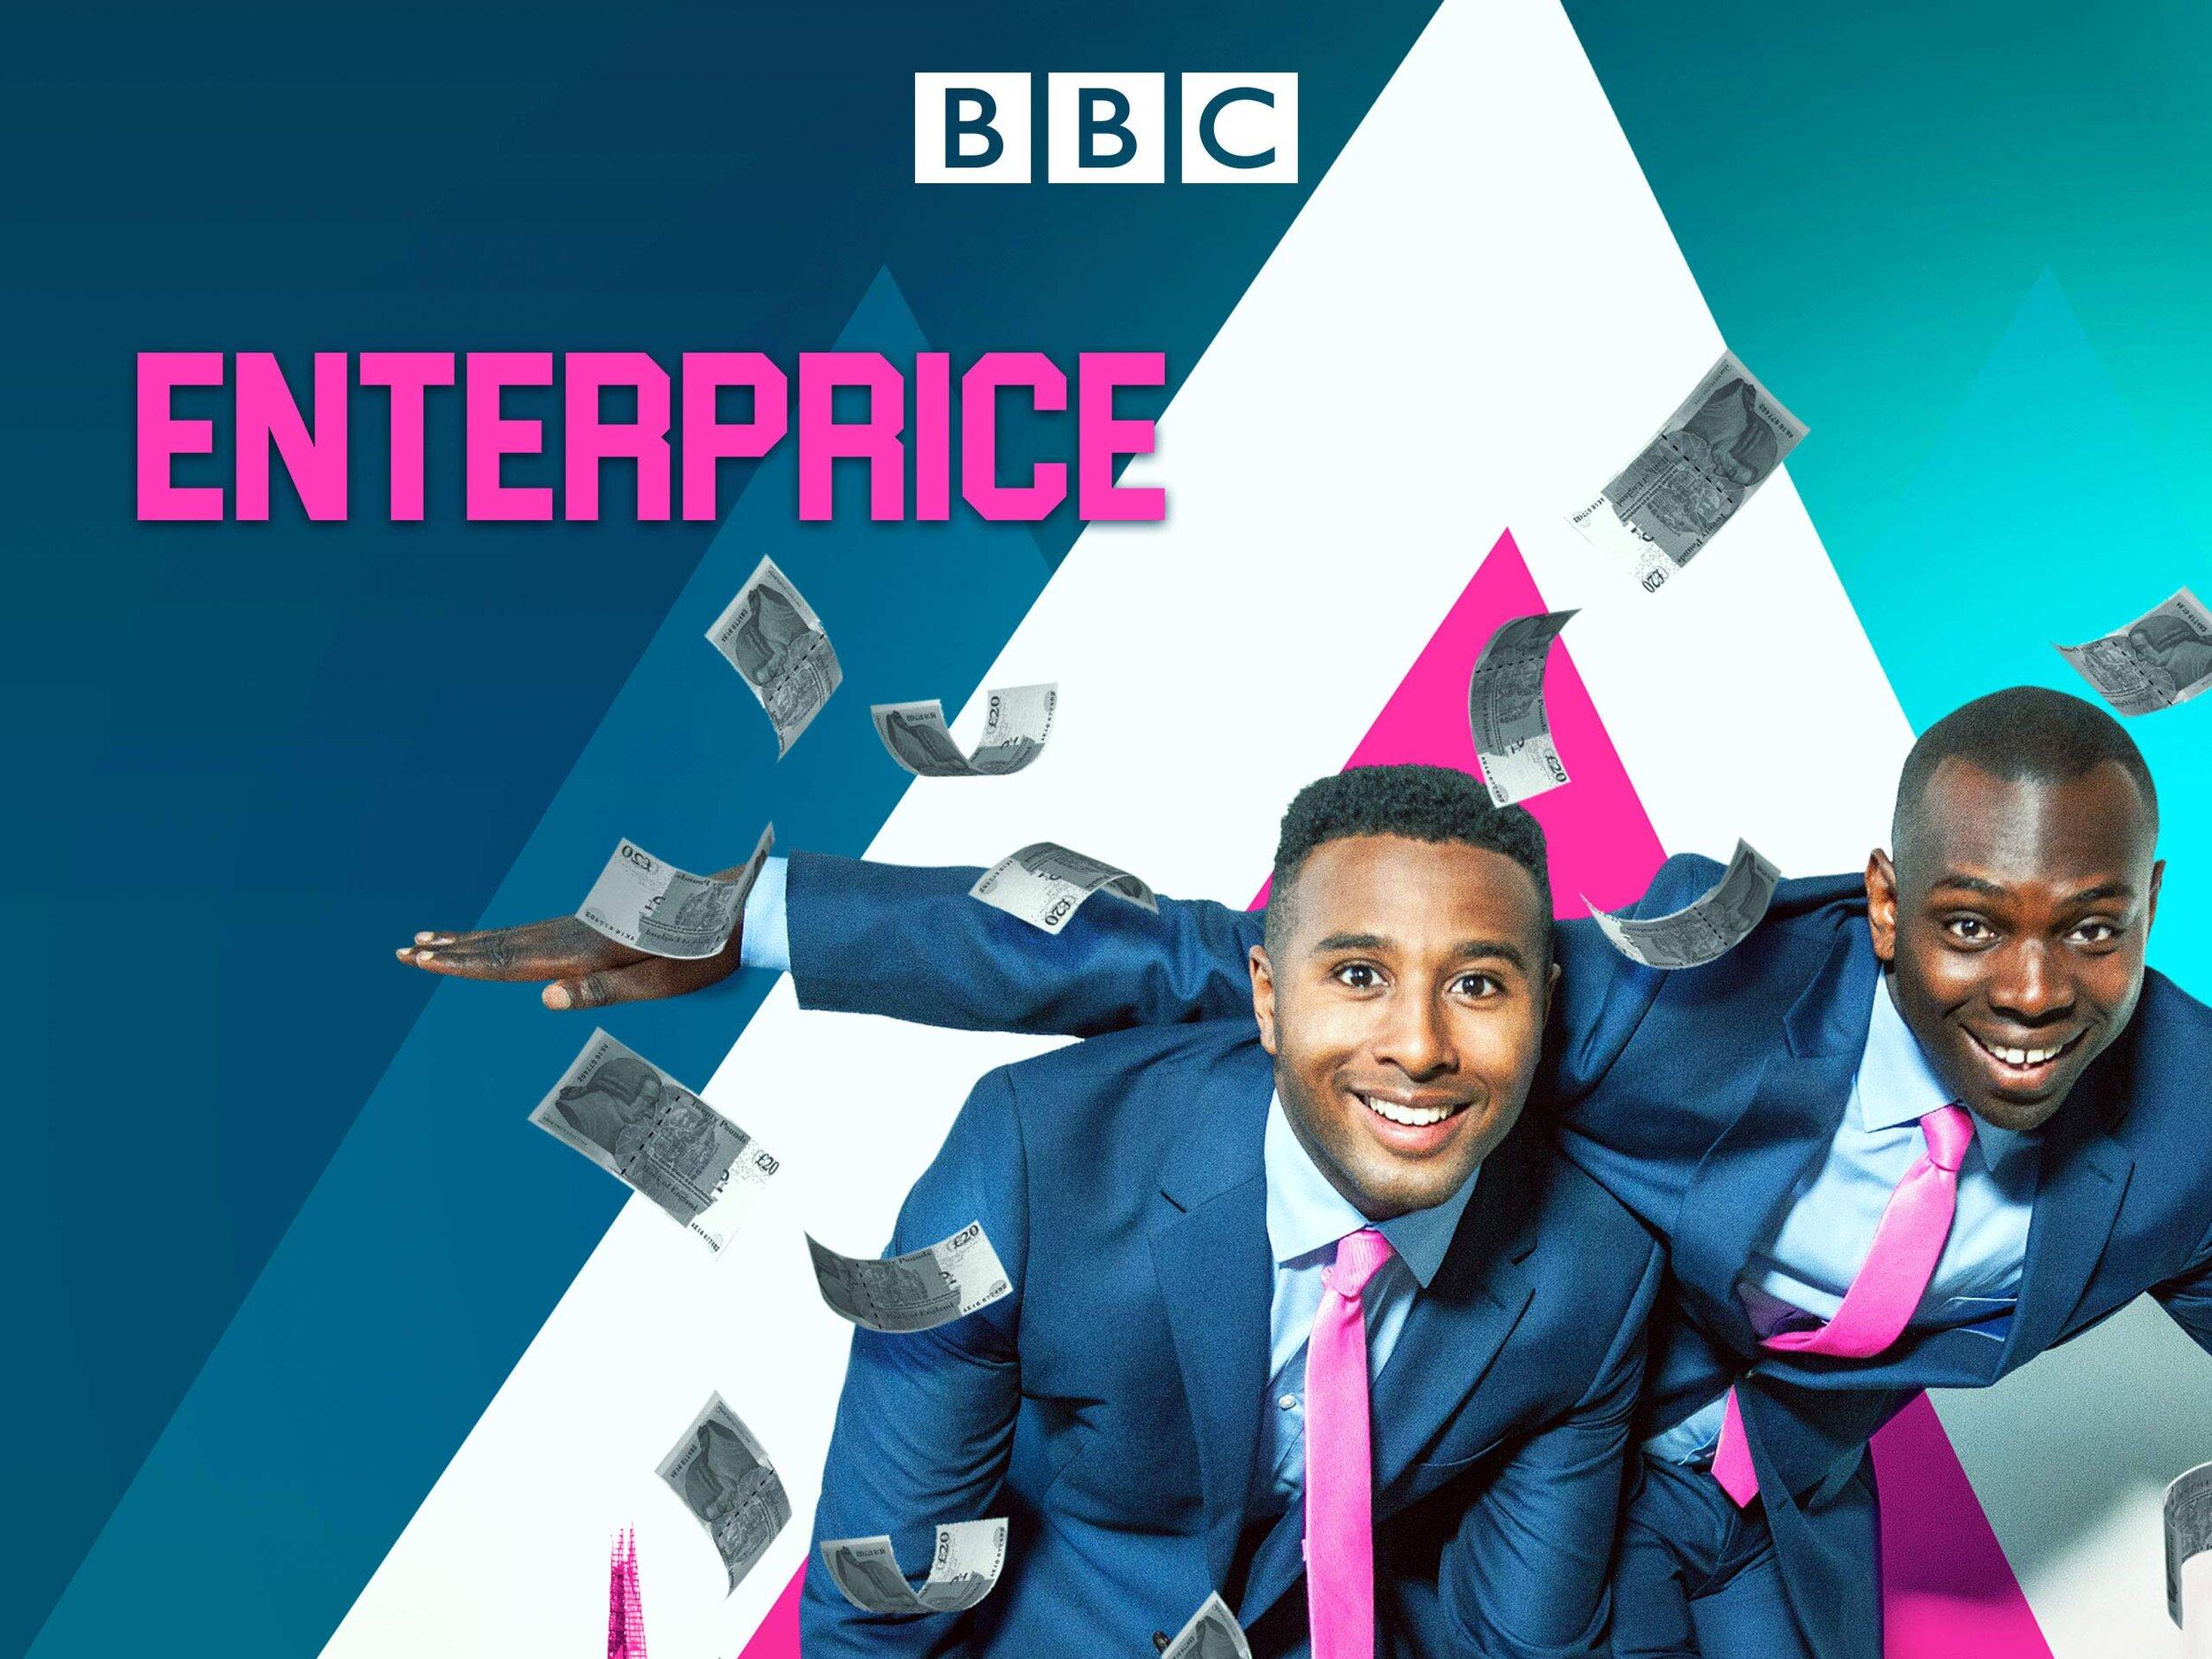 Enterprice - Series 2Production DesignerFudge Park for BBC 3IN PRODUCTION